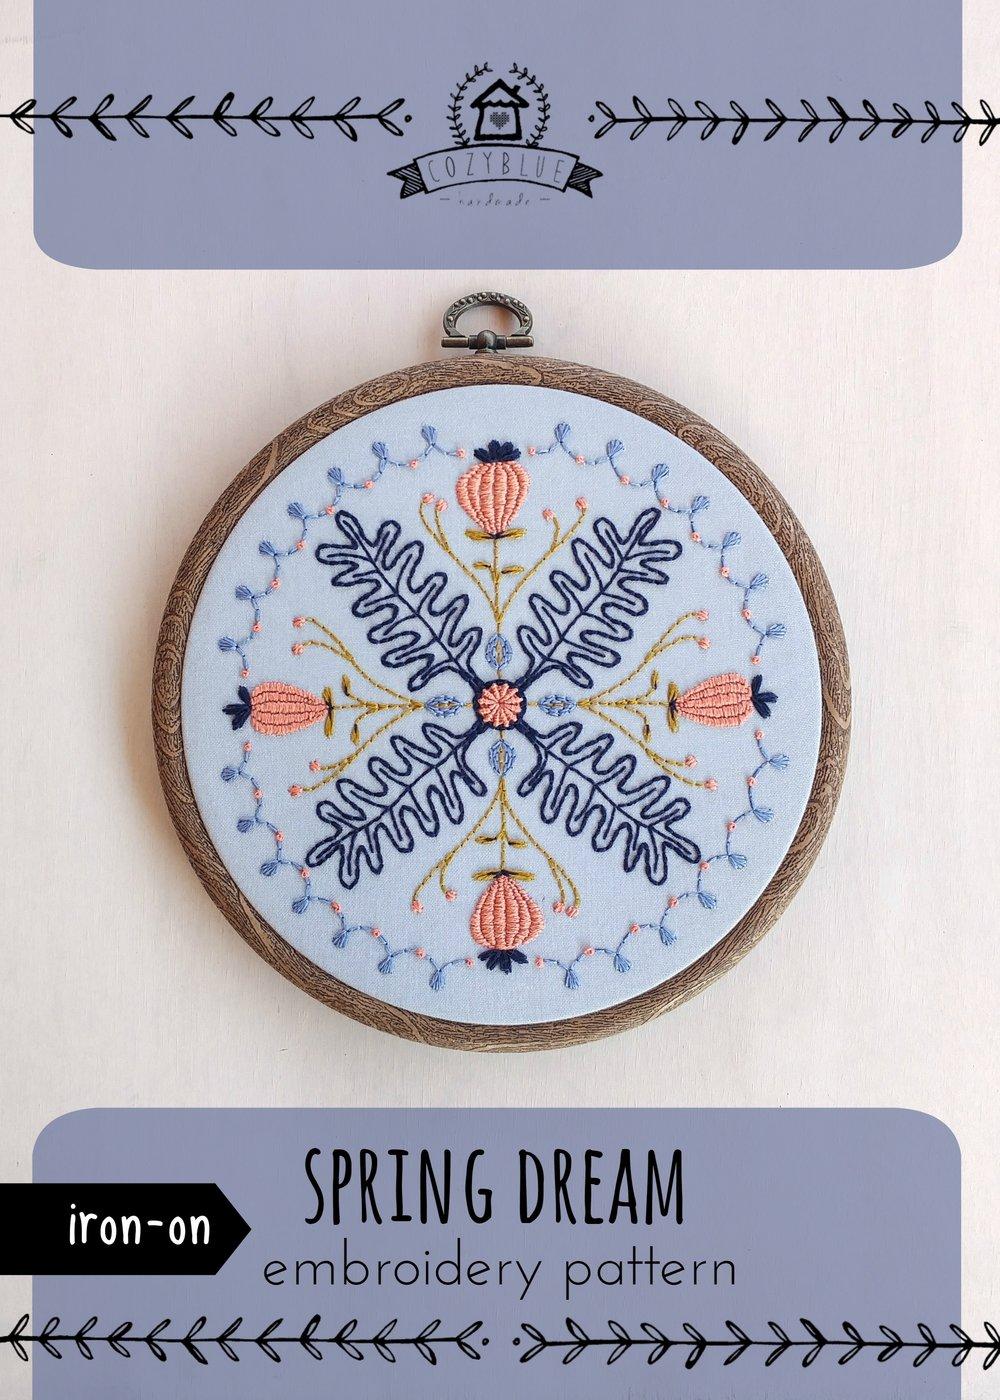 spring dream iop cover.jpg